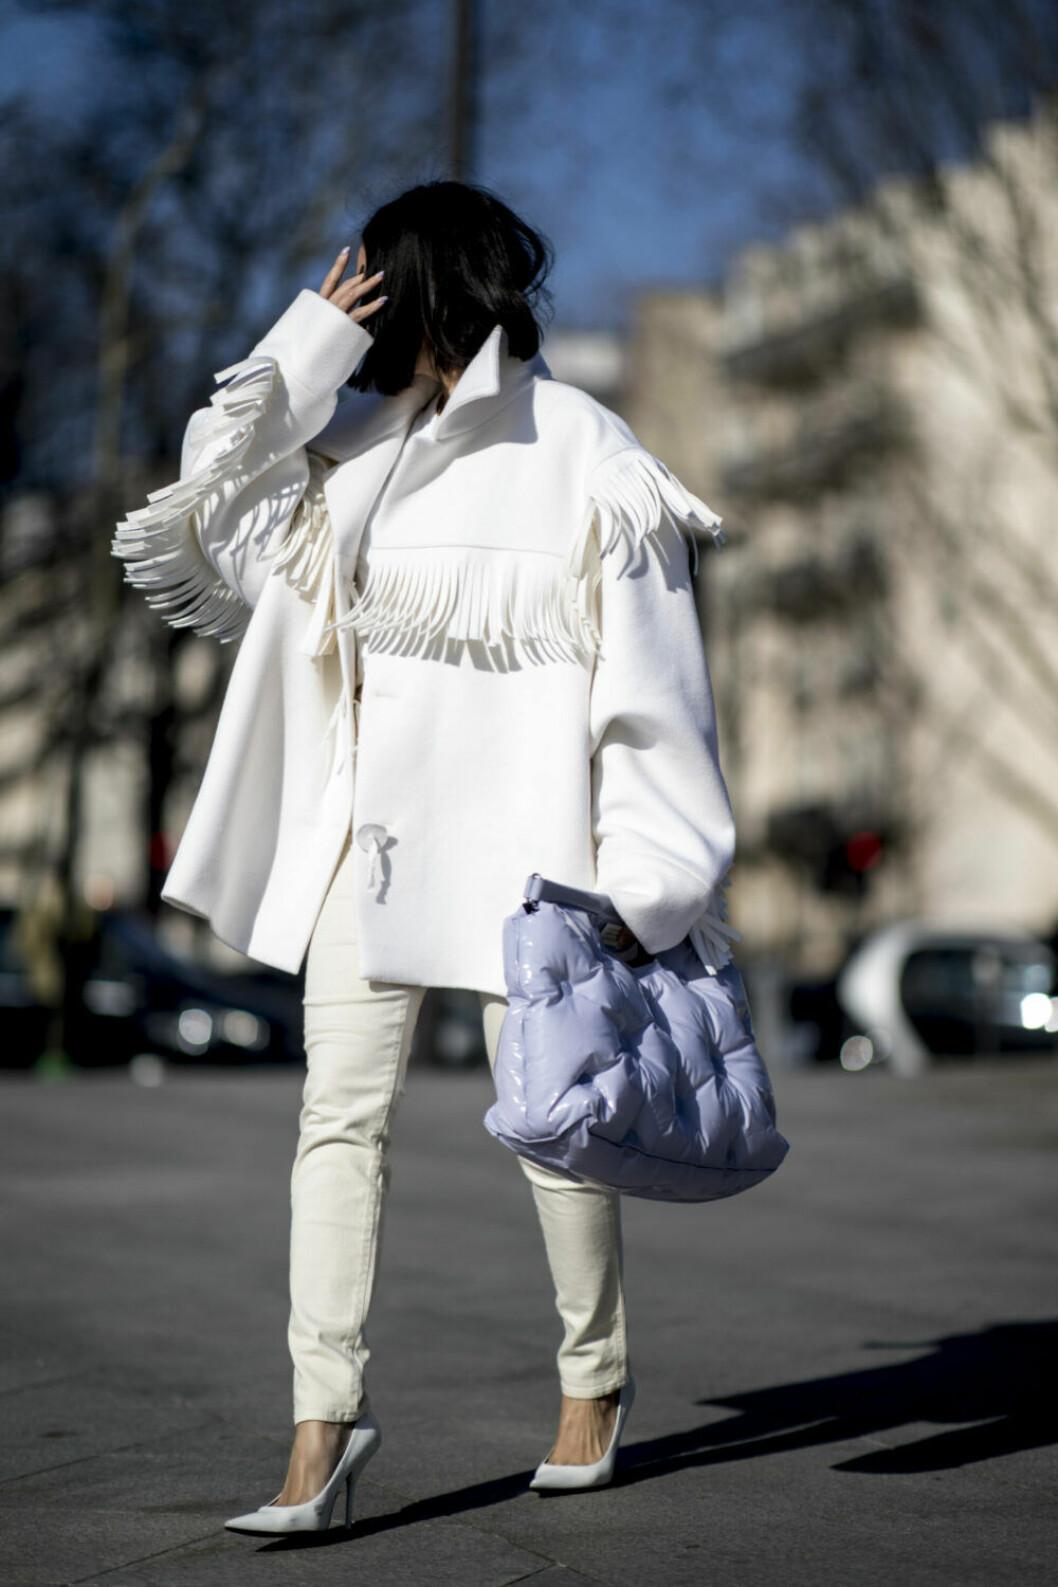 Streetstyle Paris FW, vit kappa med fransar.